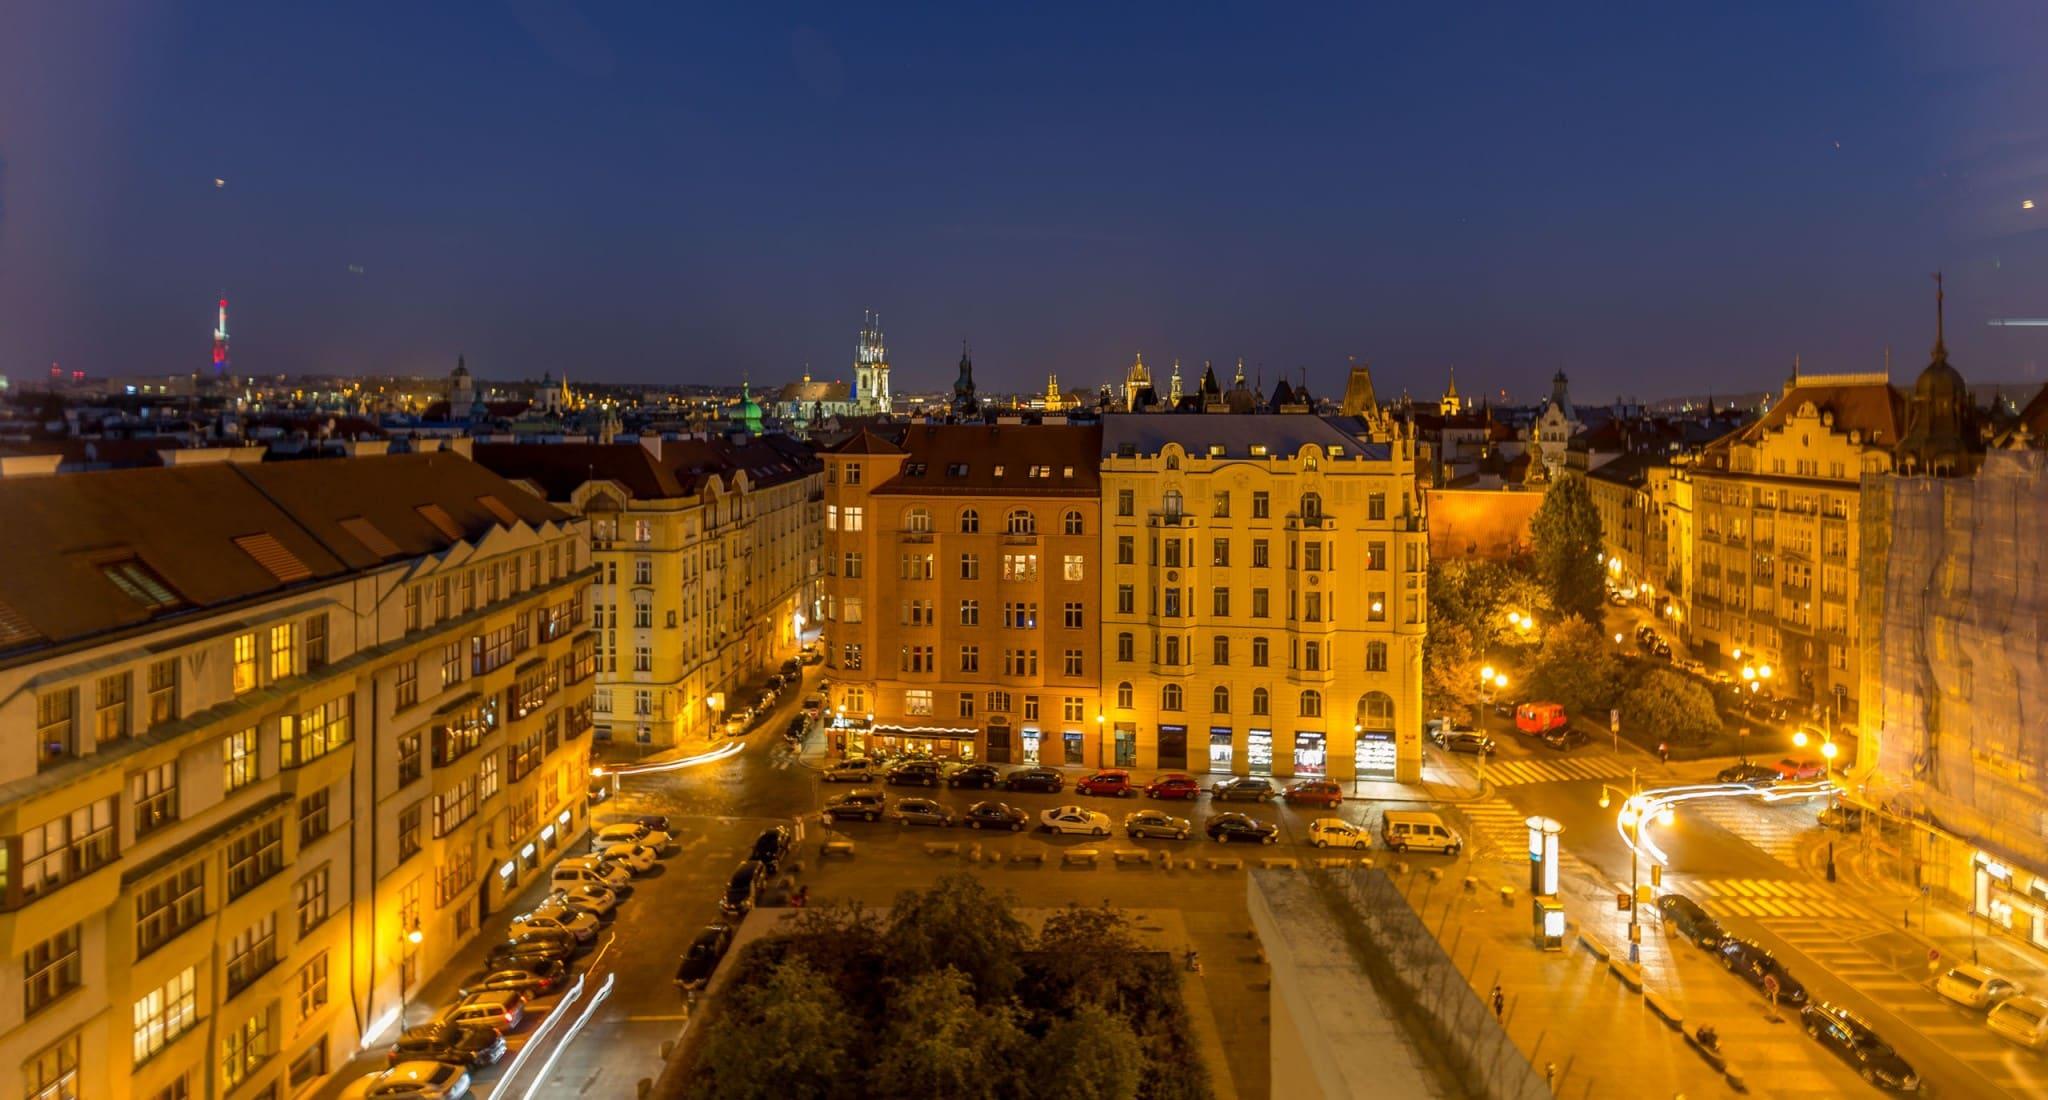 CZECH – Intercontinental Prague, a central located luxury hotel